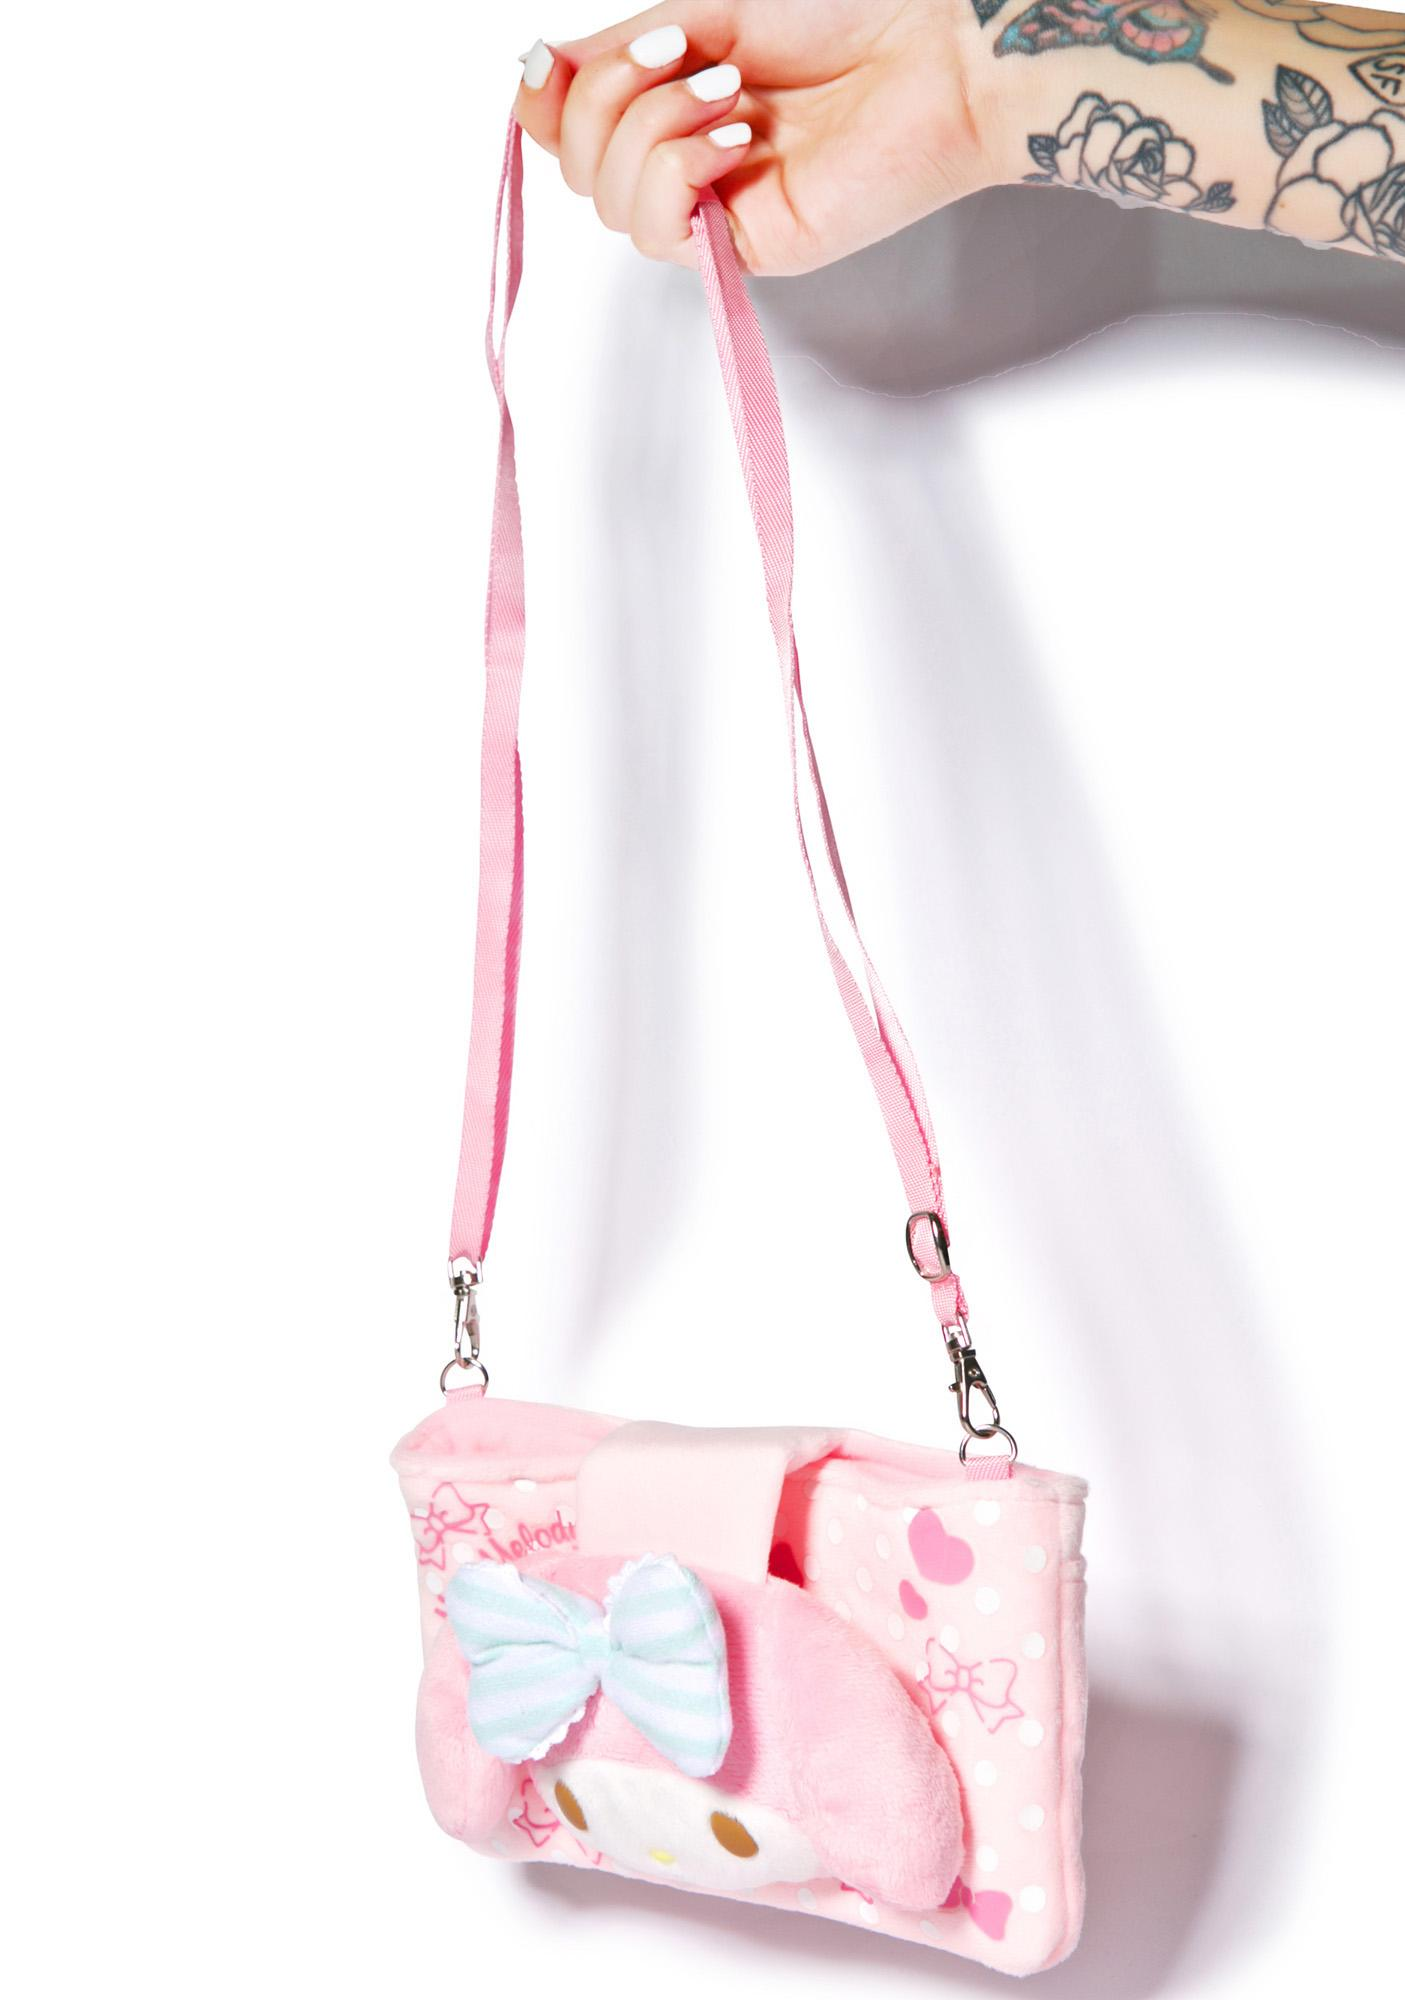 Sanrio My Melody Plush Bag